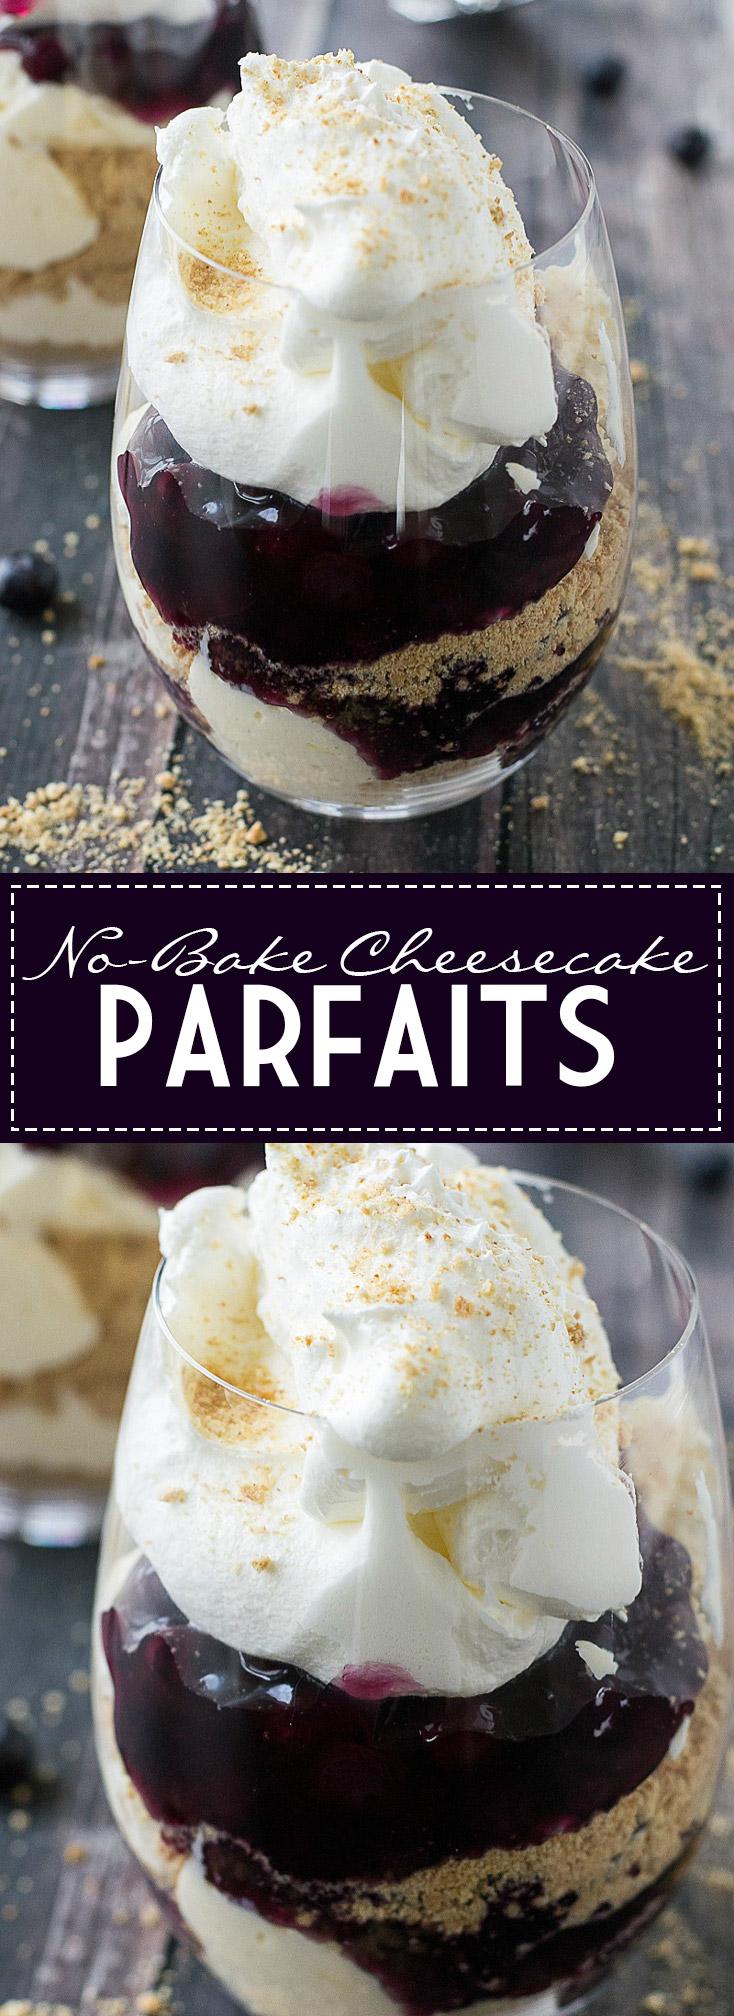 No-Bake Cheesecake Parfaits | www.motherthyme.com